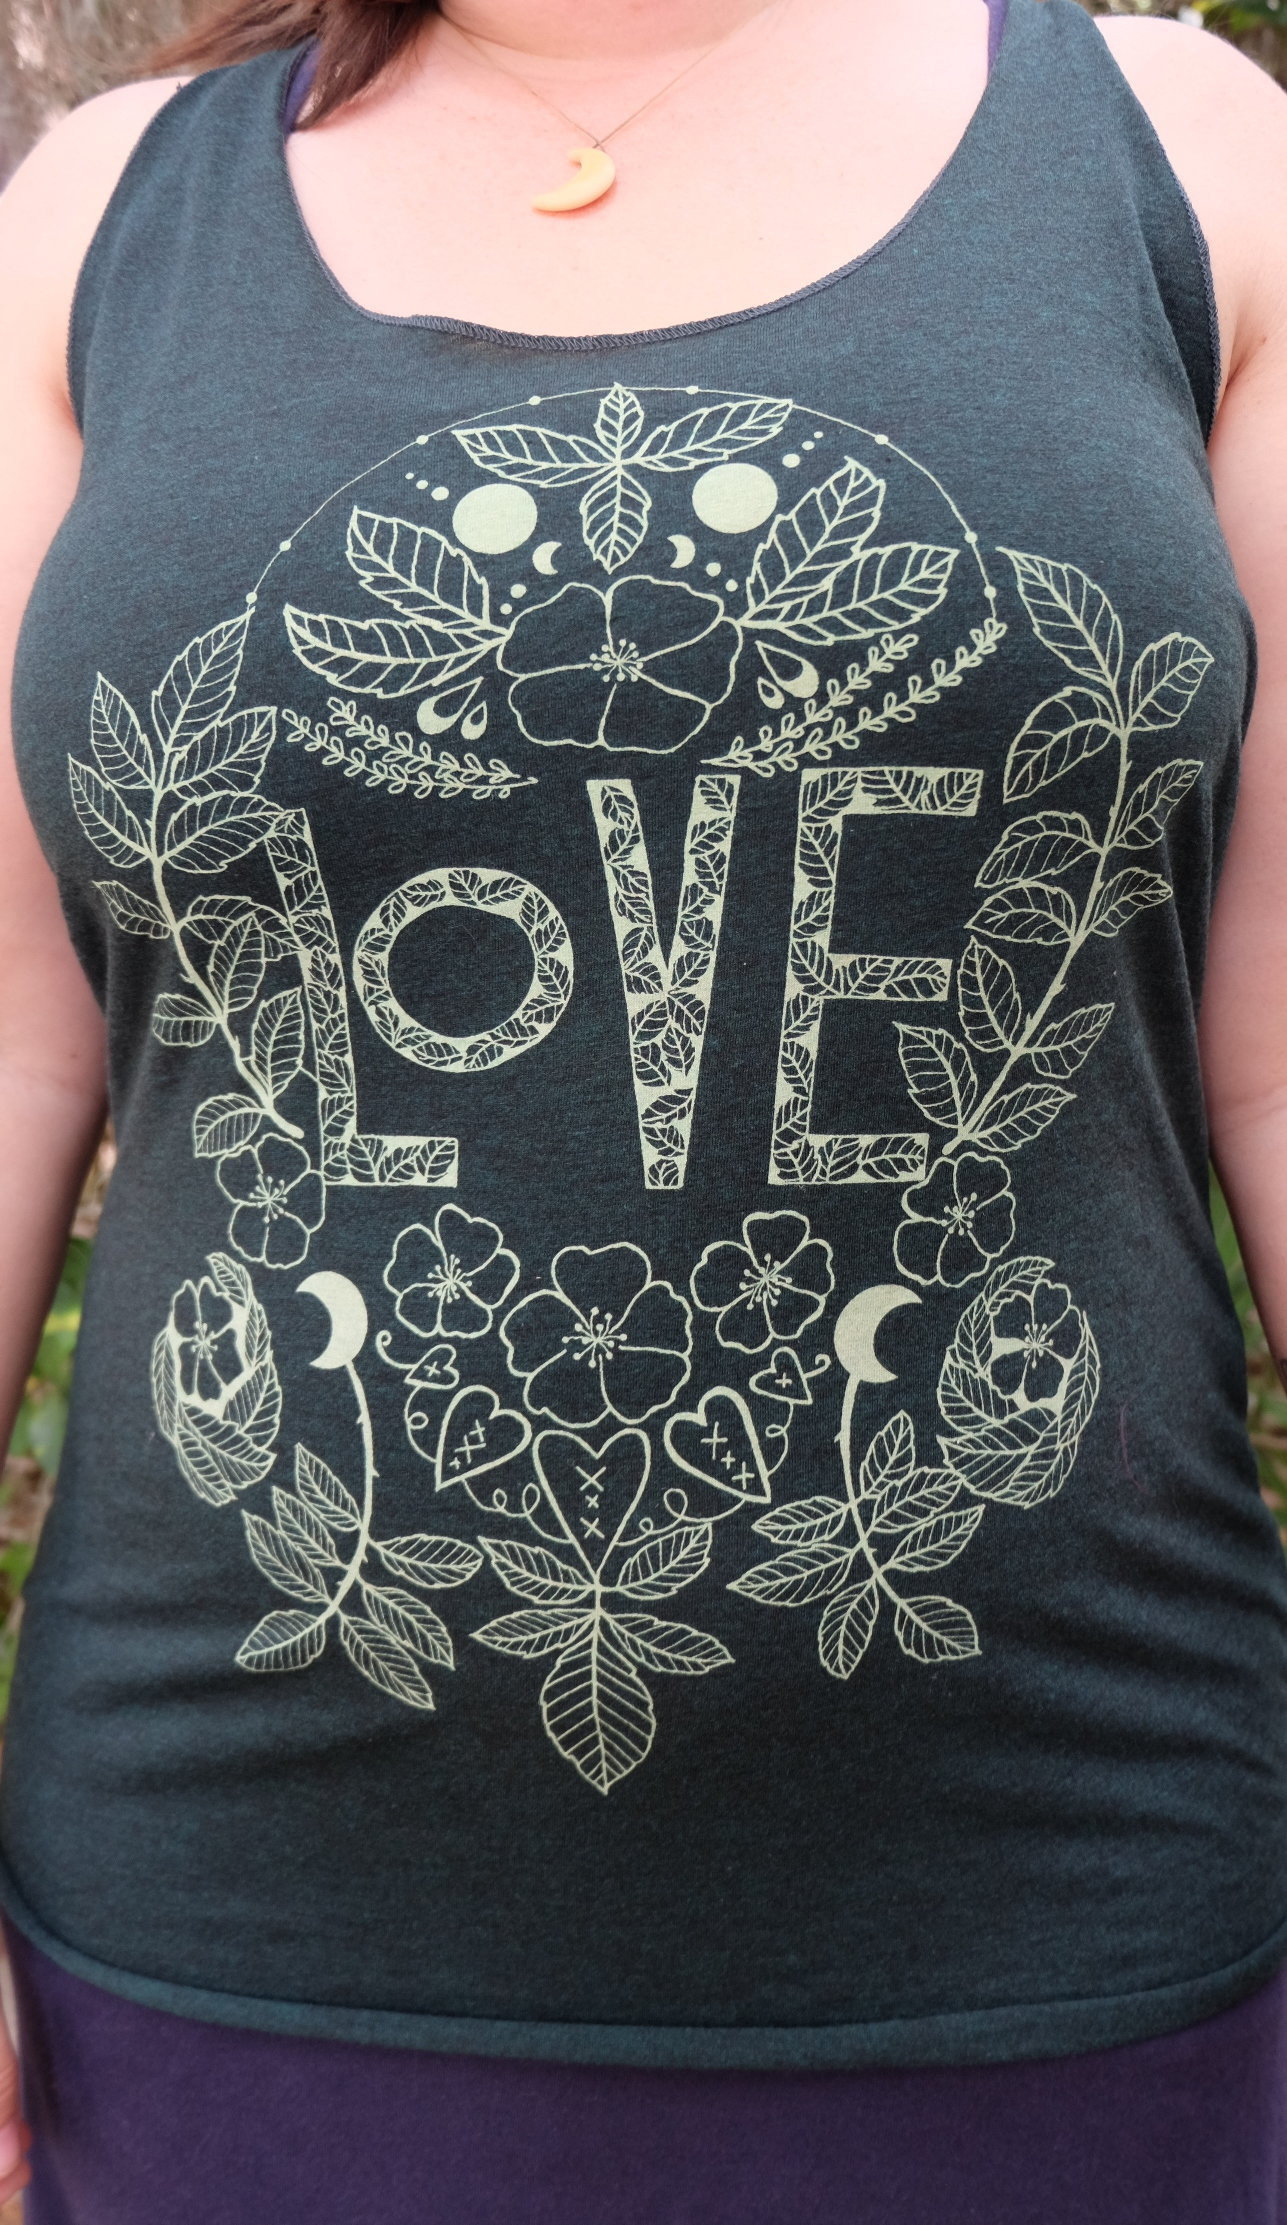 OGCP Ladies Tank - Love, Wild Rose 00013